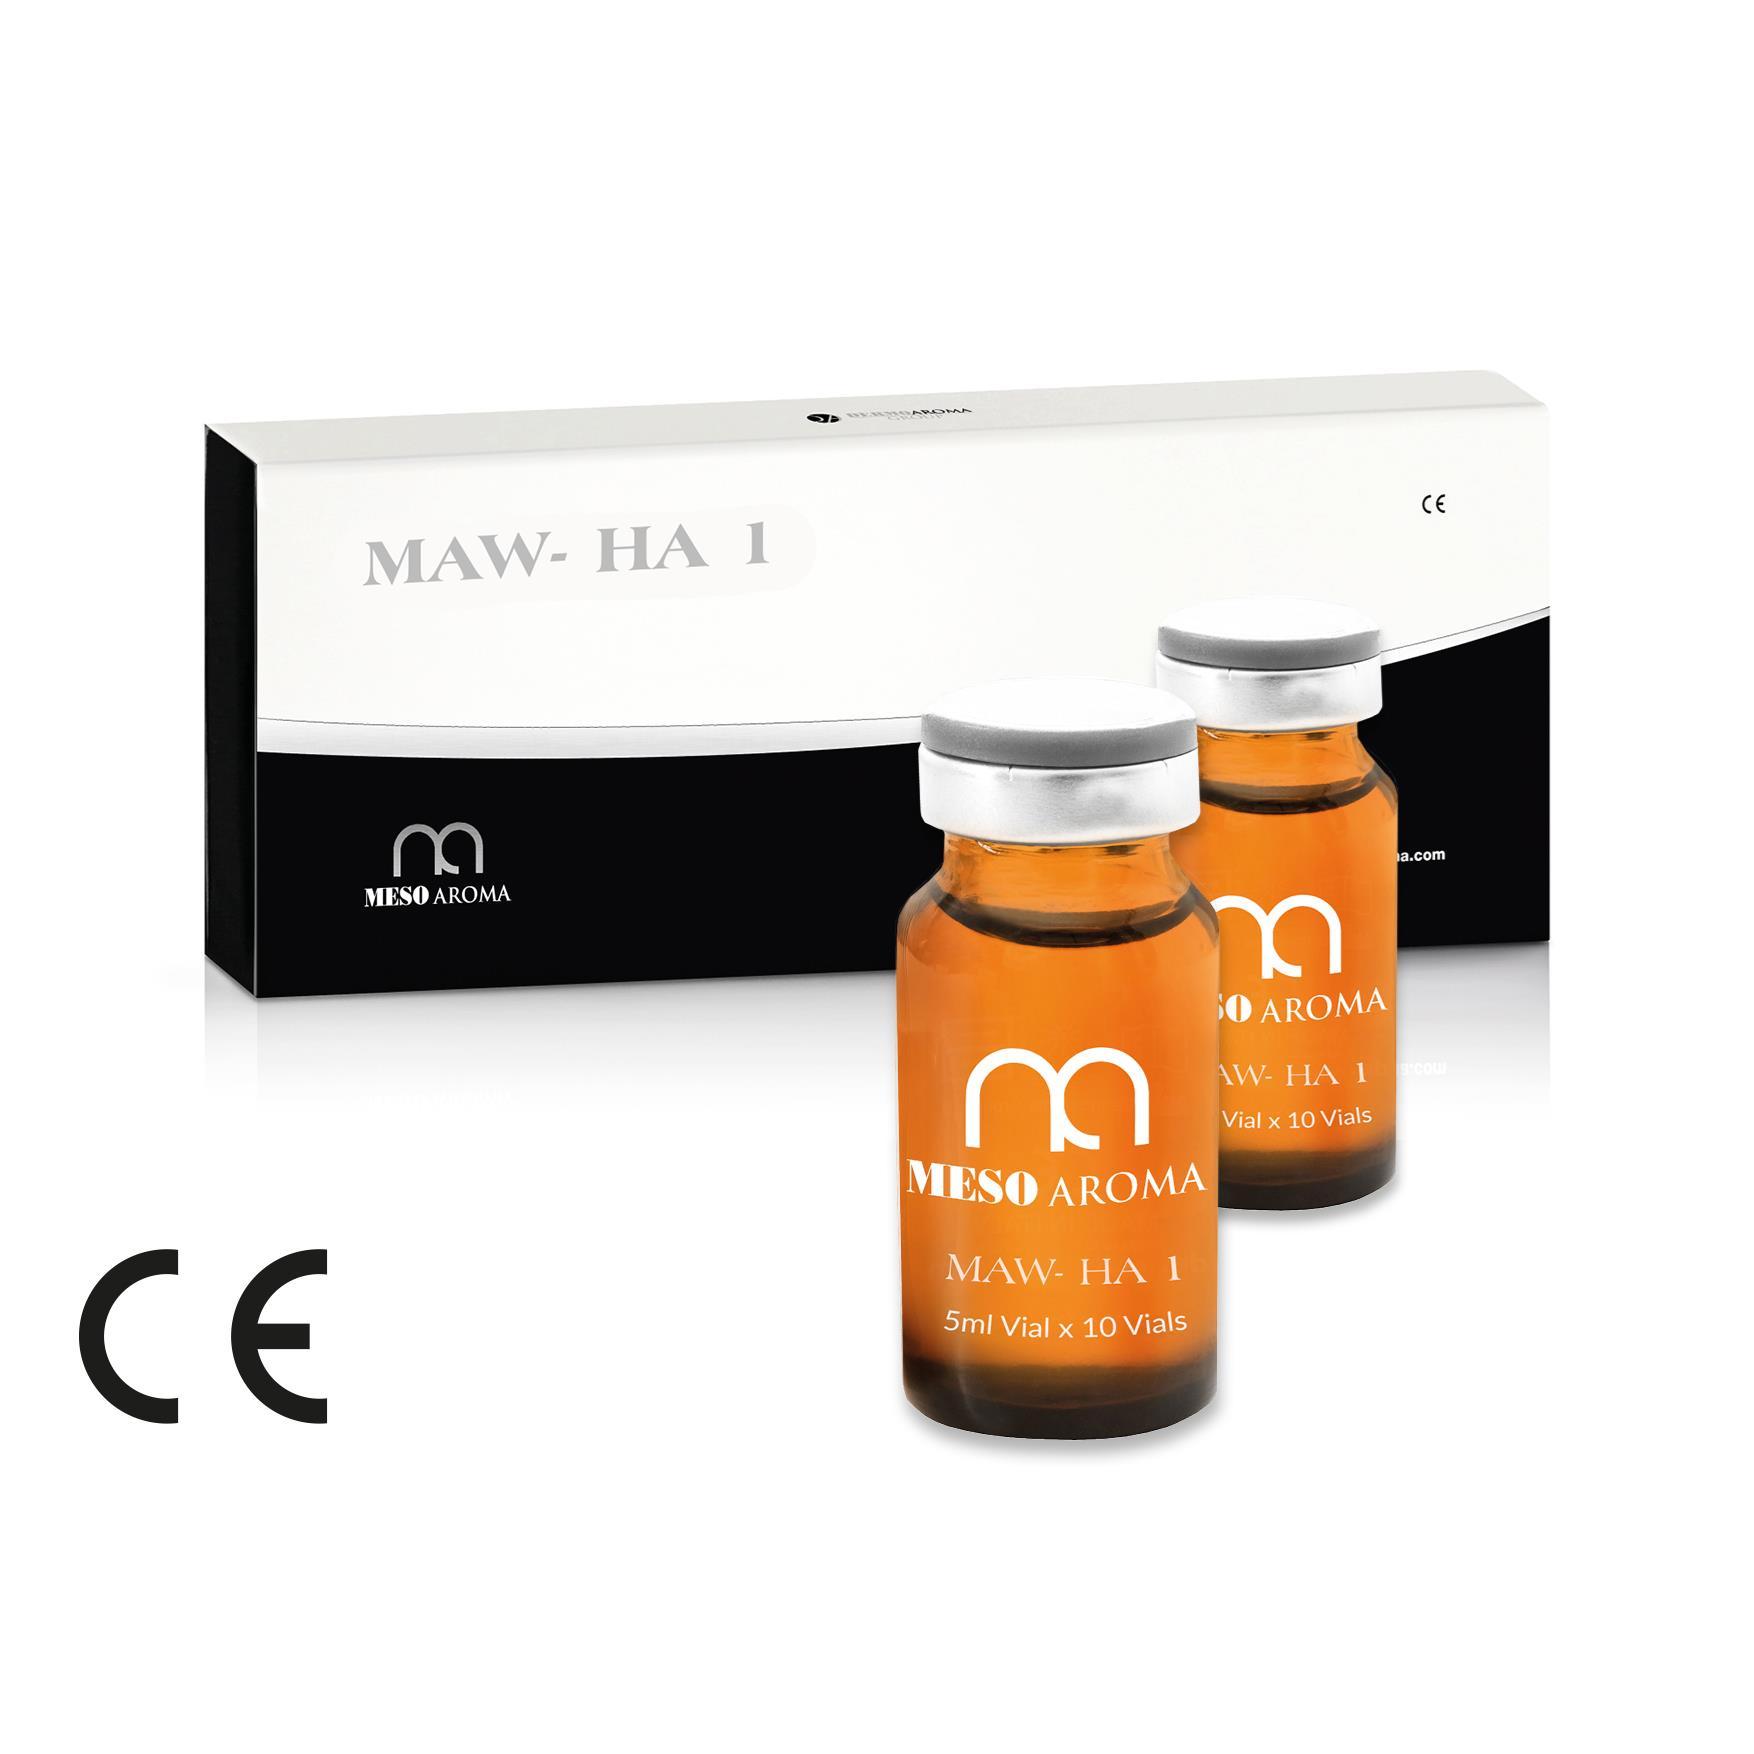 ampulka-do-mezoterapii-mesoaroma-HA1-kwas hialuronowy-1_-5ml